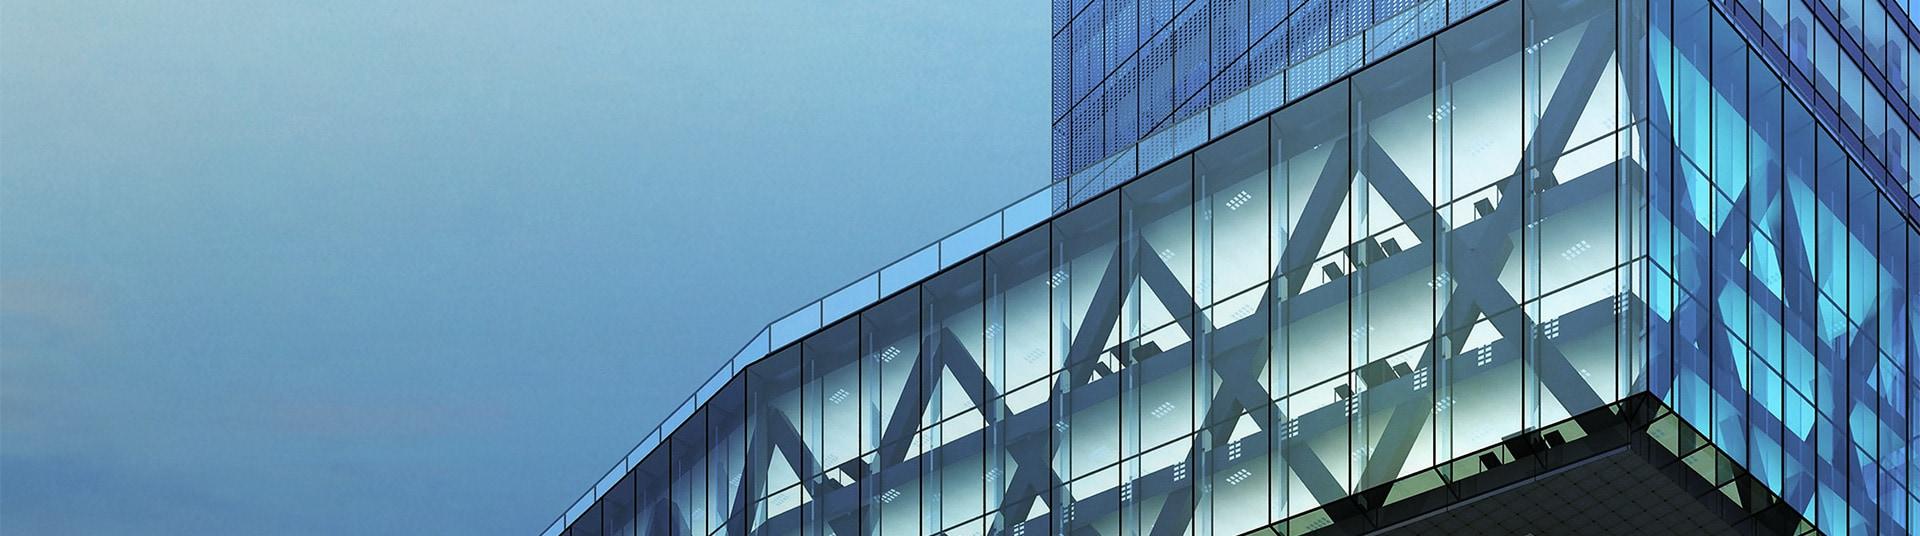 Bim pilot projects autodesk for Architecture firms